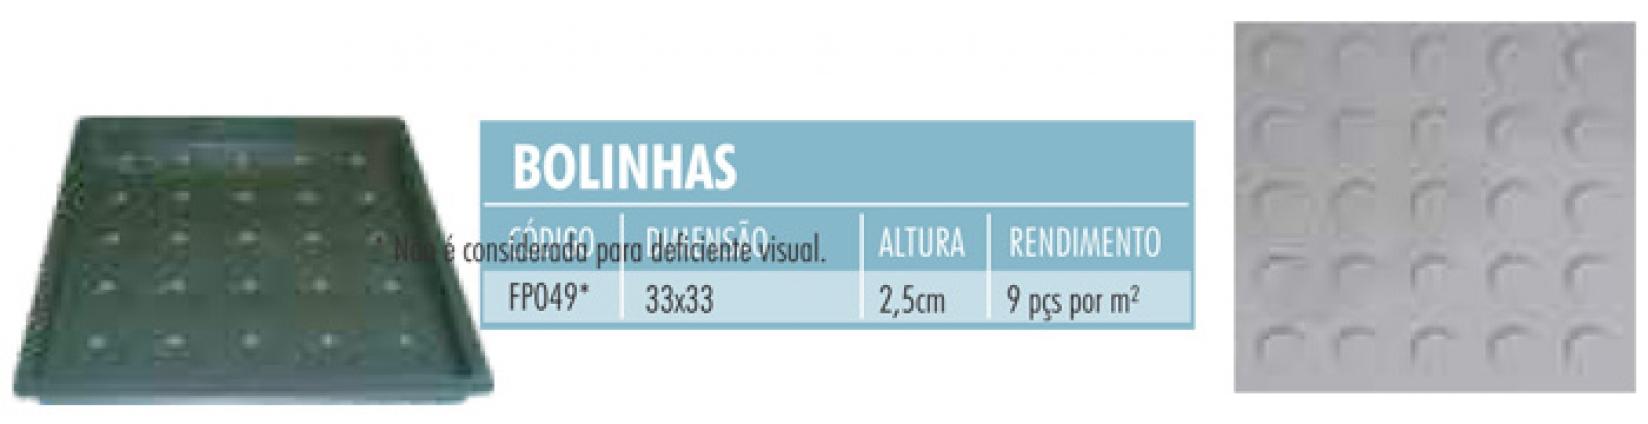 FormasPlasticas-20150313120533.jpg